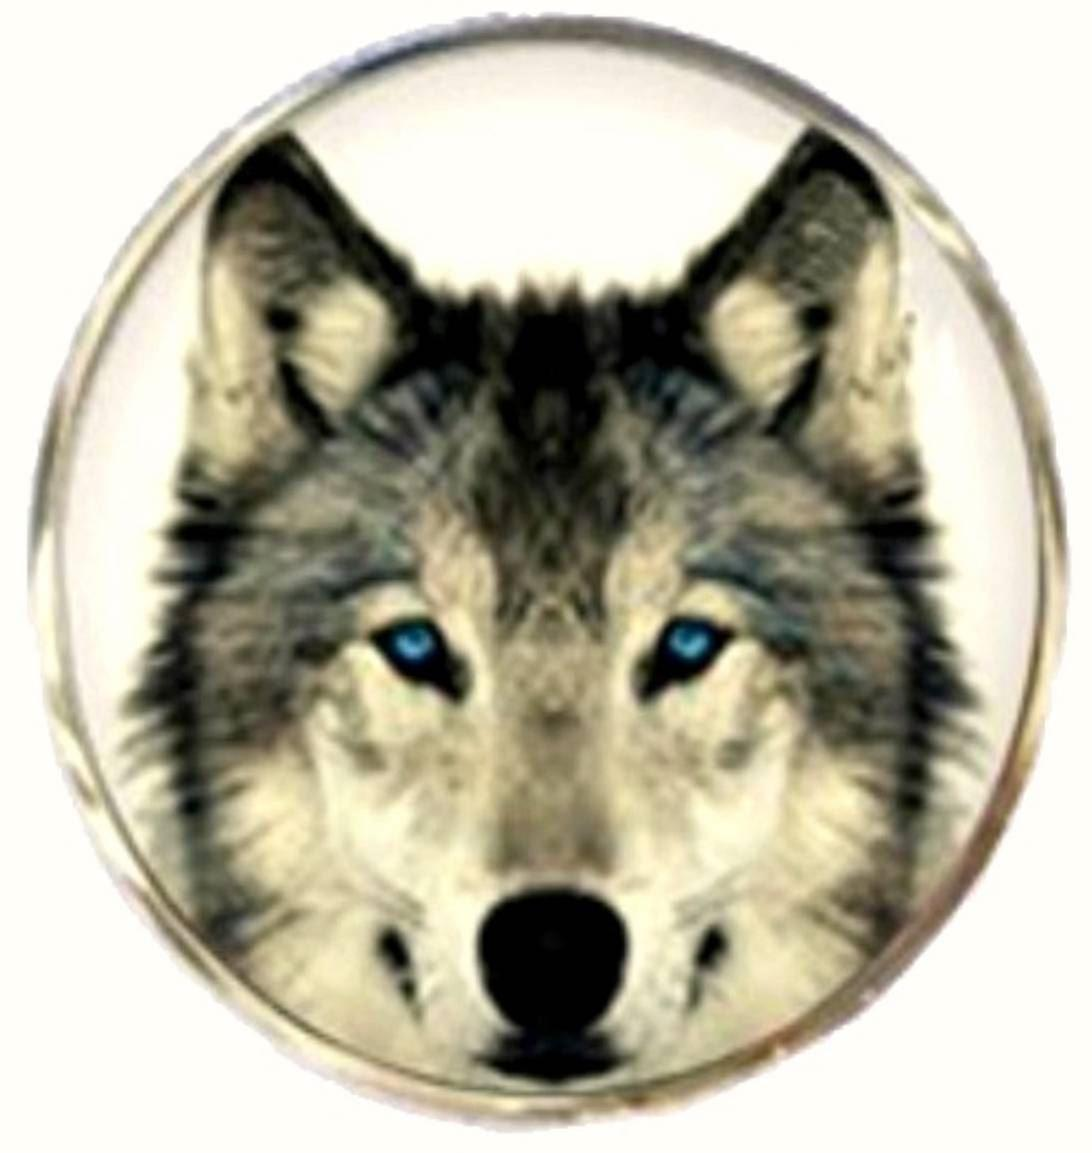 Bassin and Brown Round Arctic Wolf Cufflinks - White